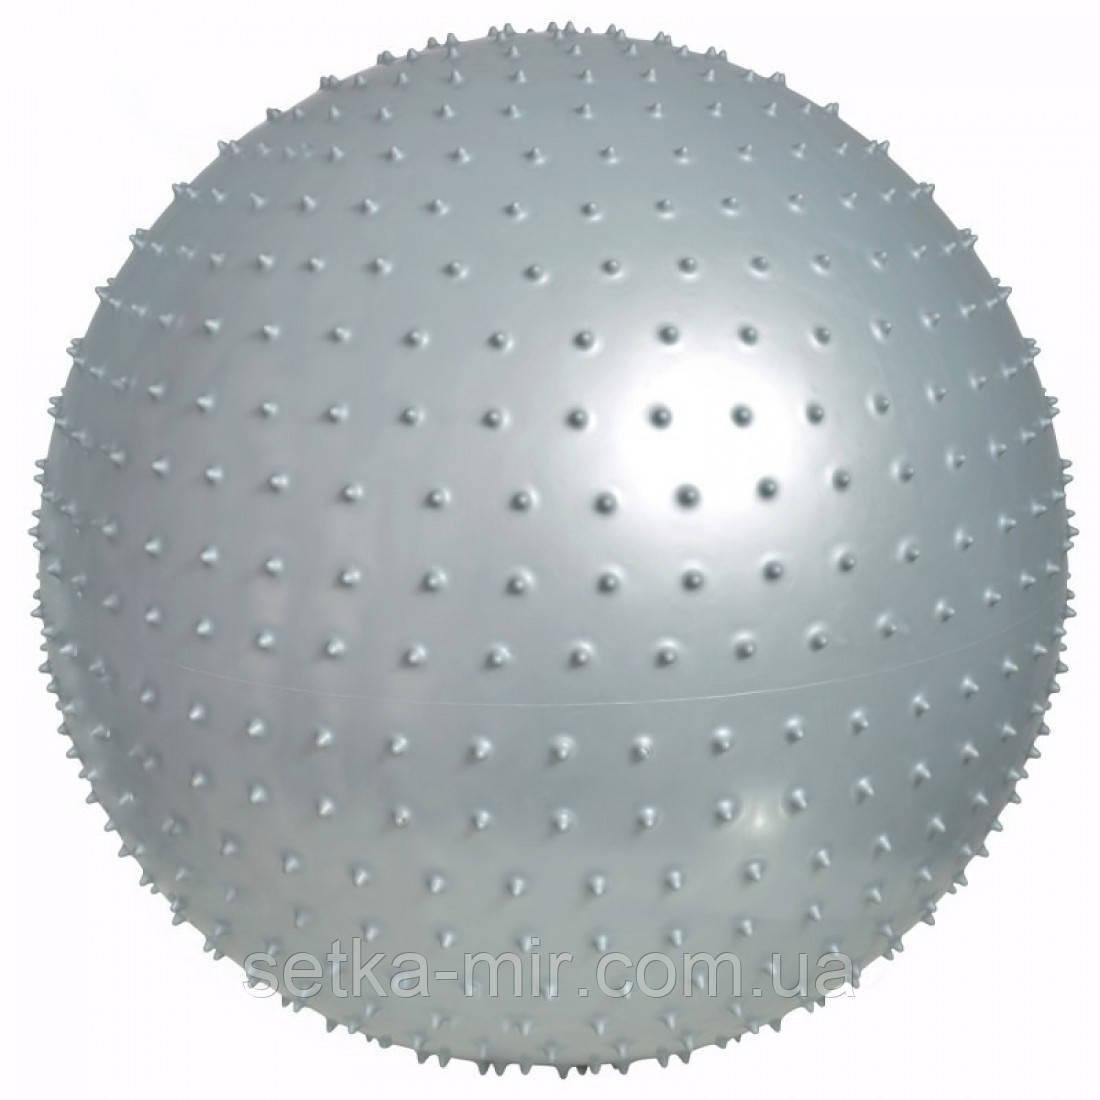 Мяч для фитнеса (фитбол) 75см LiveUp MASSAGE BALL